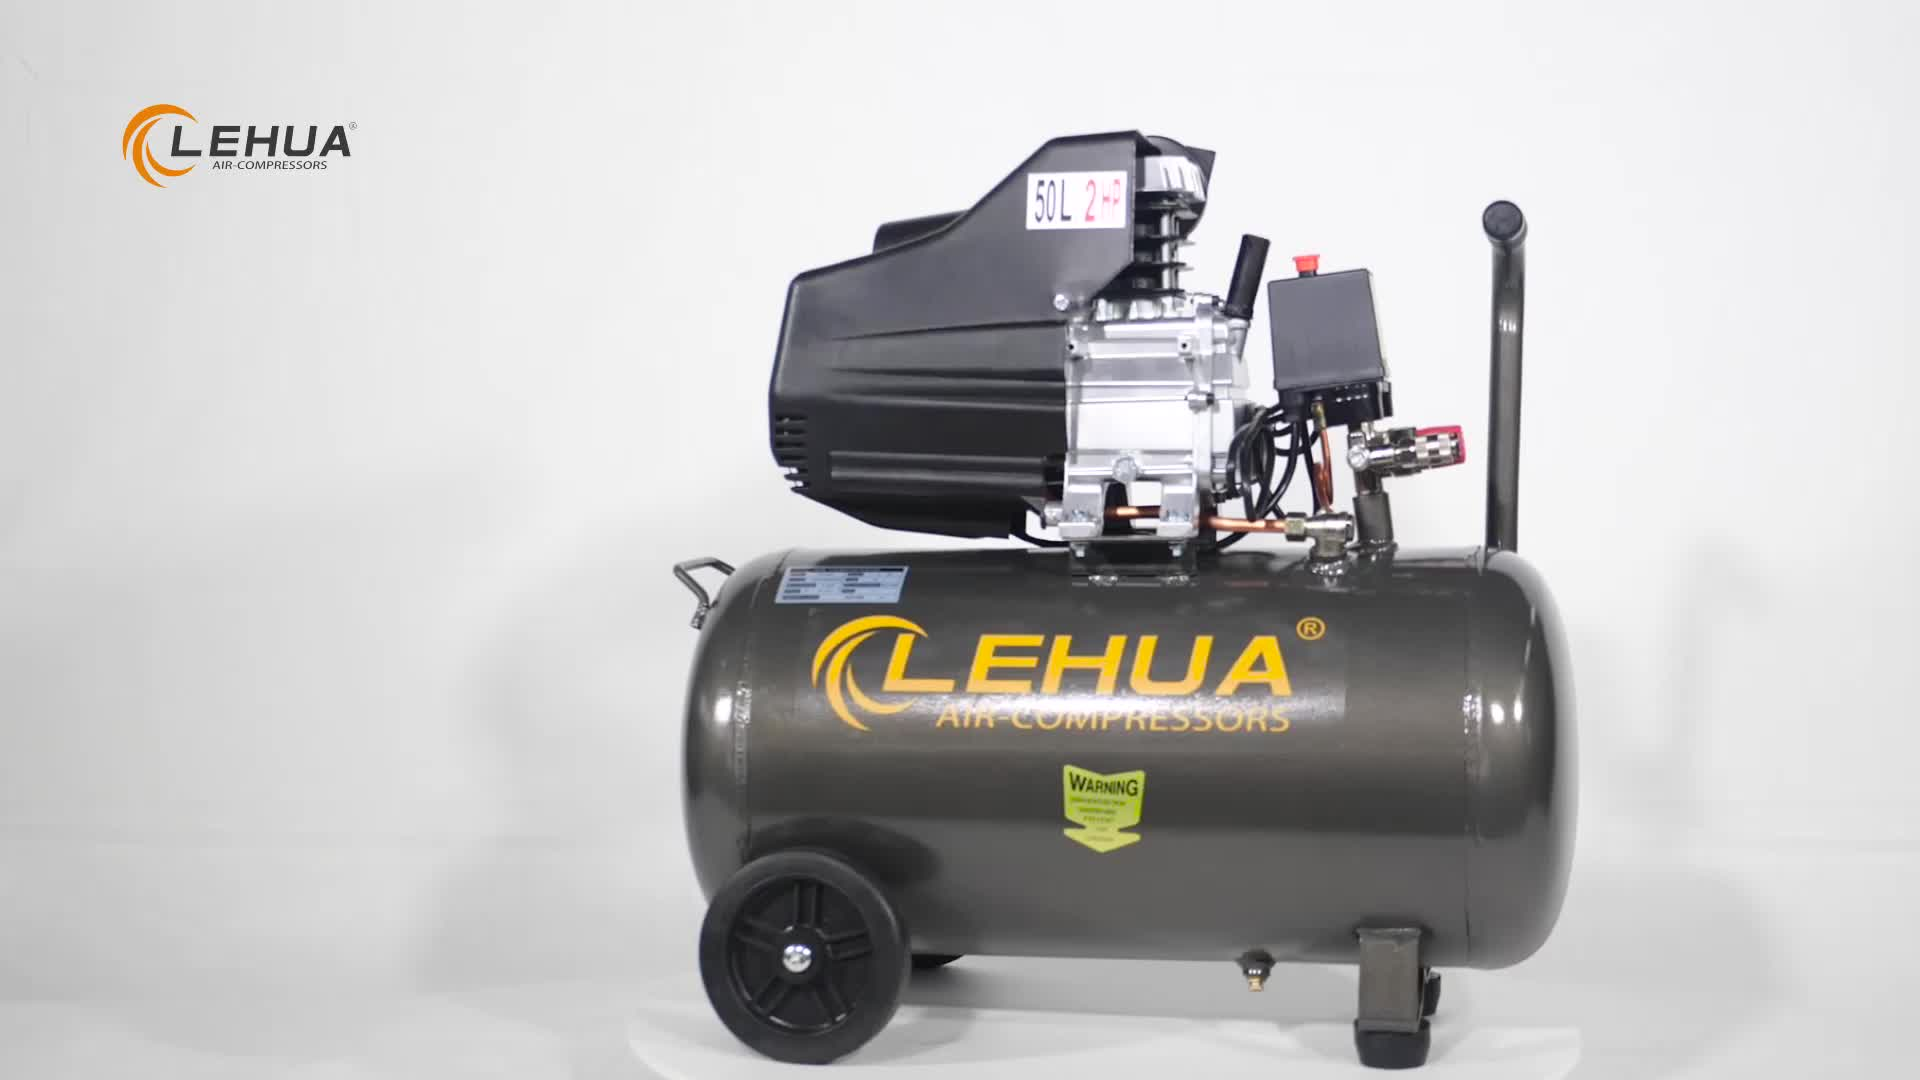 ac compressor drive car tyre air compressor silent oil-less air compressor 240v 50hz